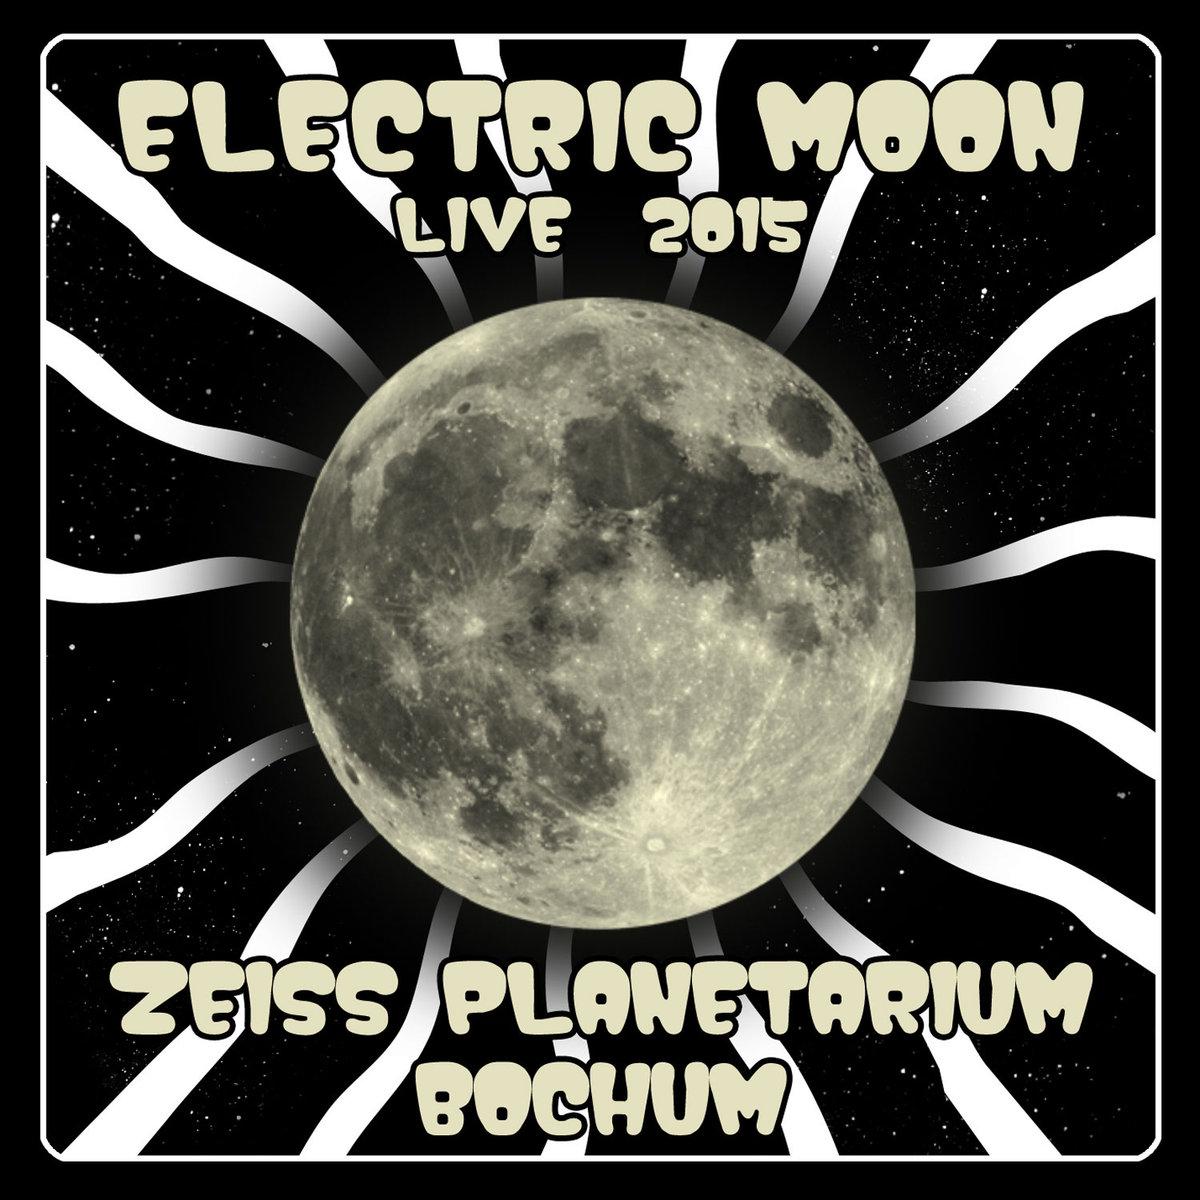 Electric Moon - Zeiss Planetarium Bochum